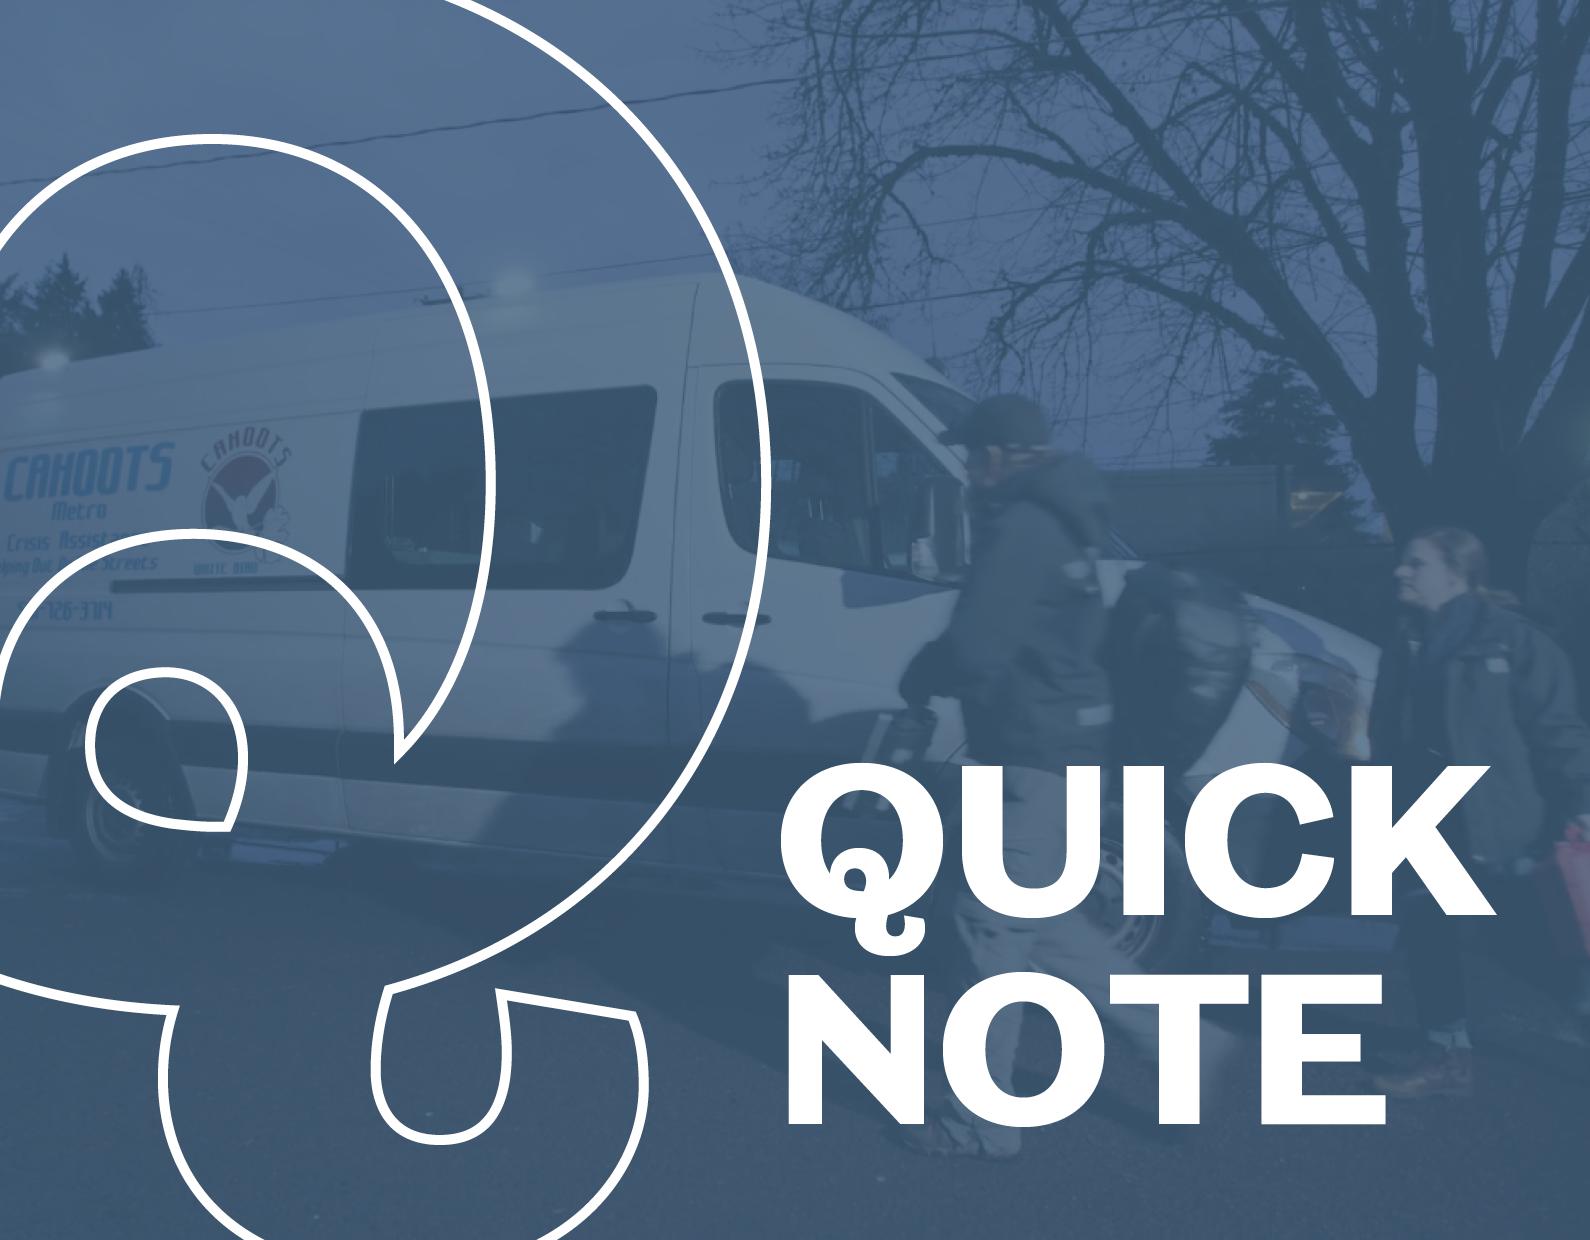 QuickNote_CommunitySafety